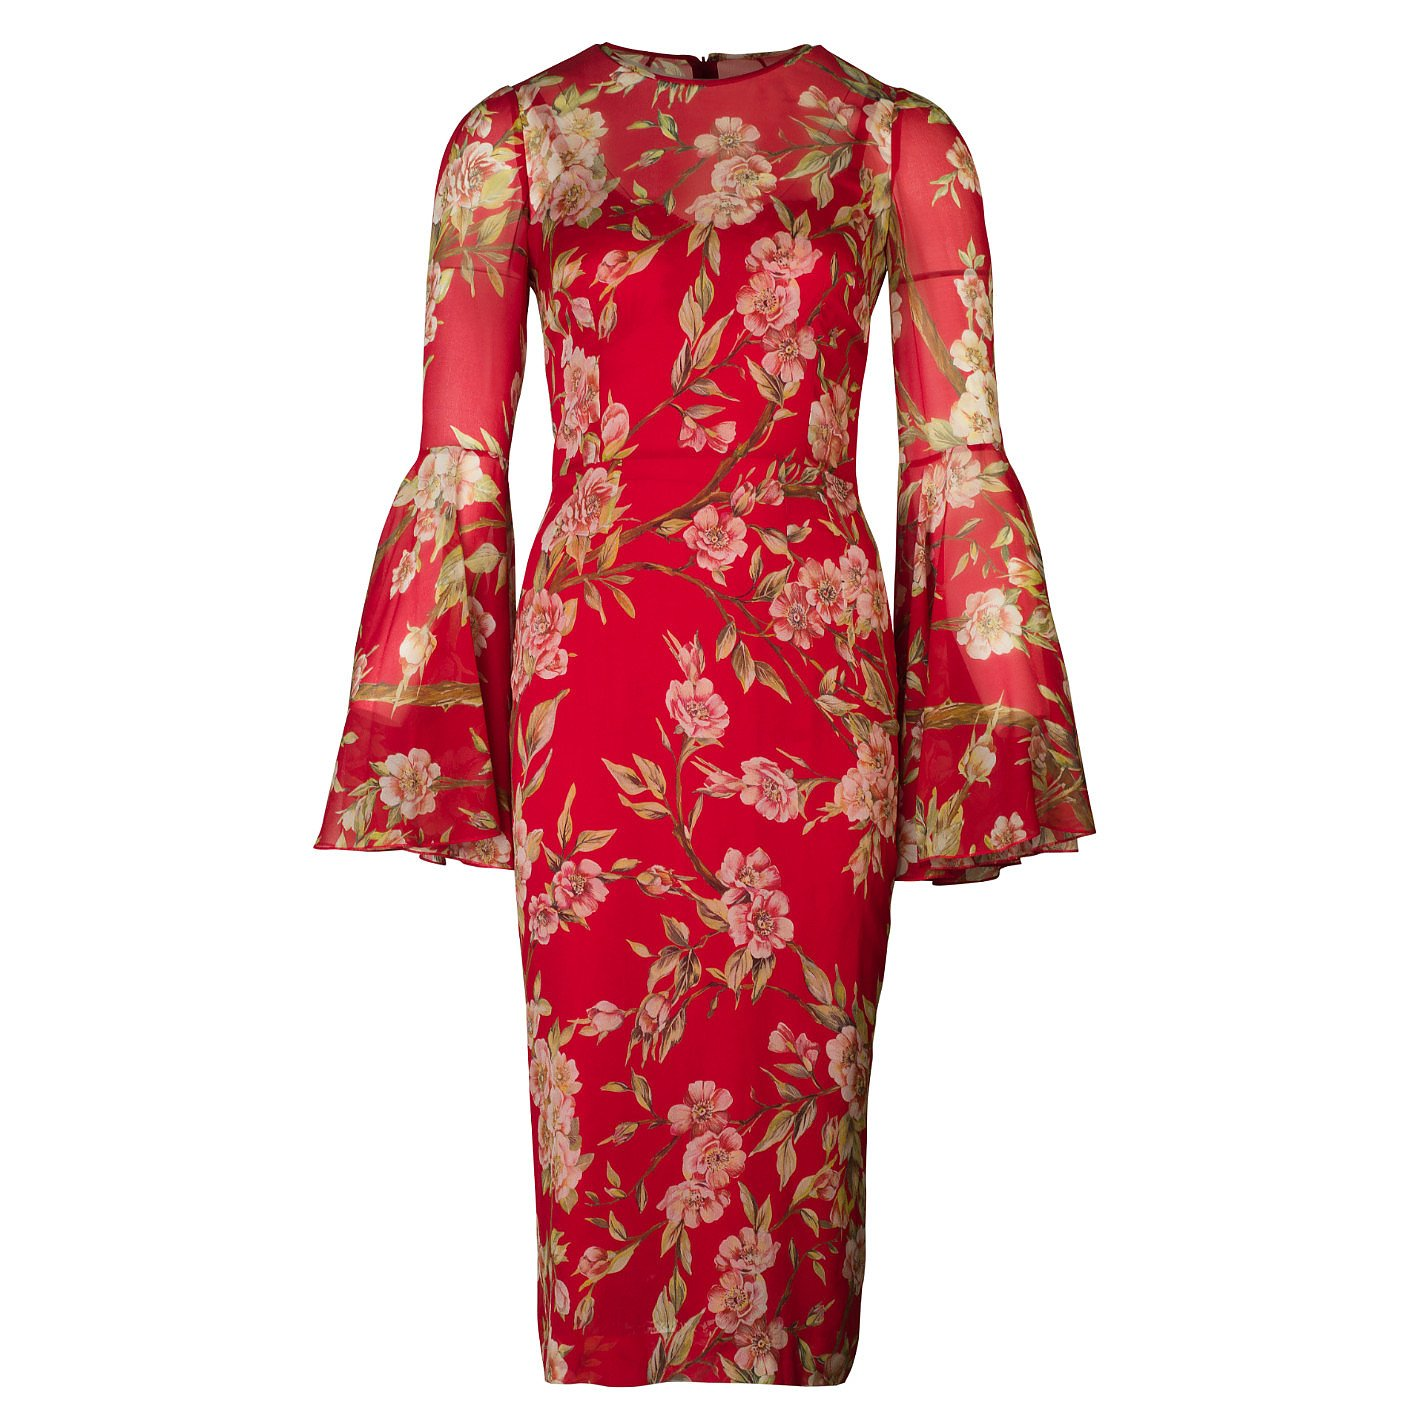 DOLCE & GABBANA Floral Print Bell-Sleeve Midi Dress